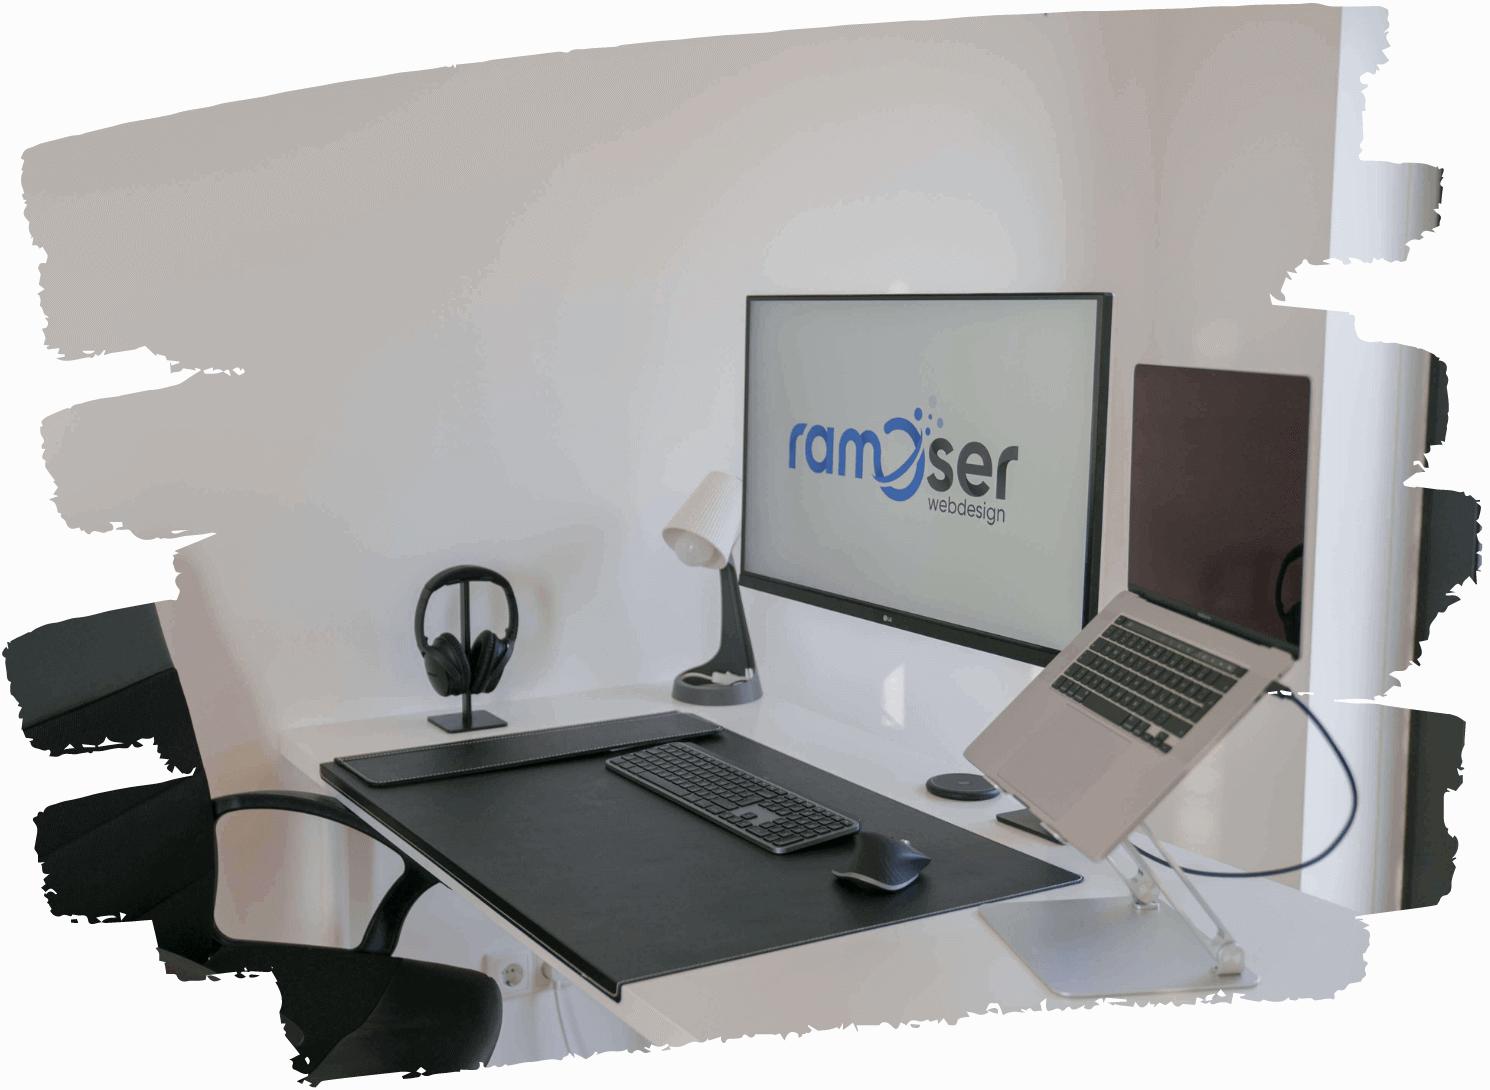 ramoser-webdesign-arbeitsplatz